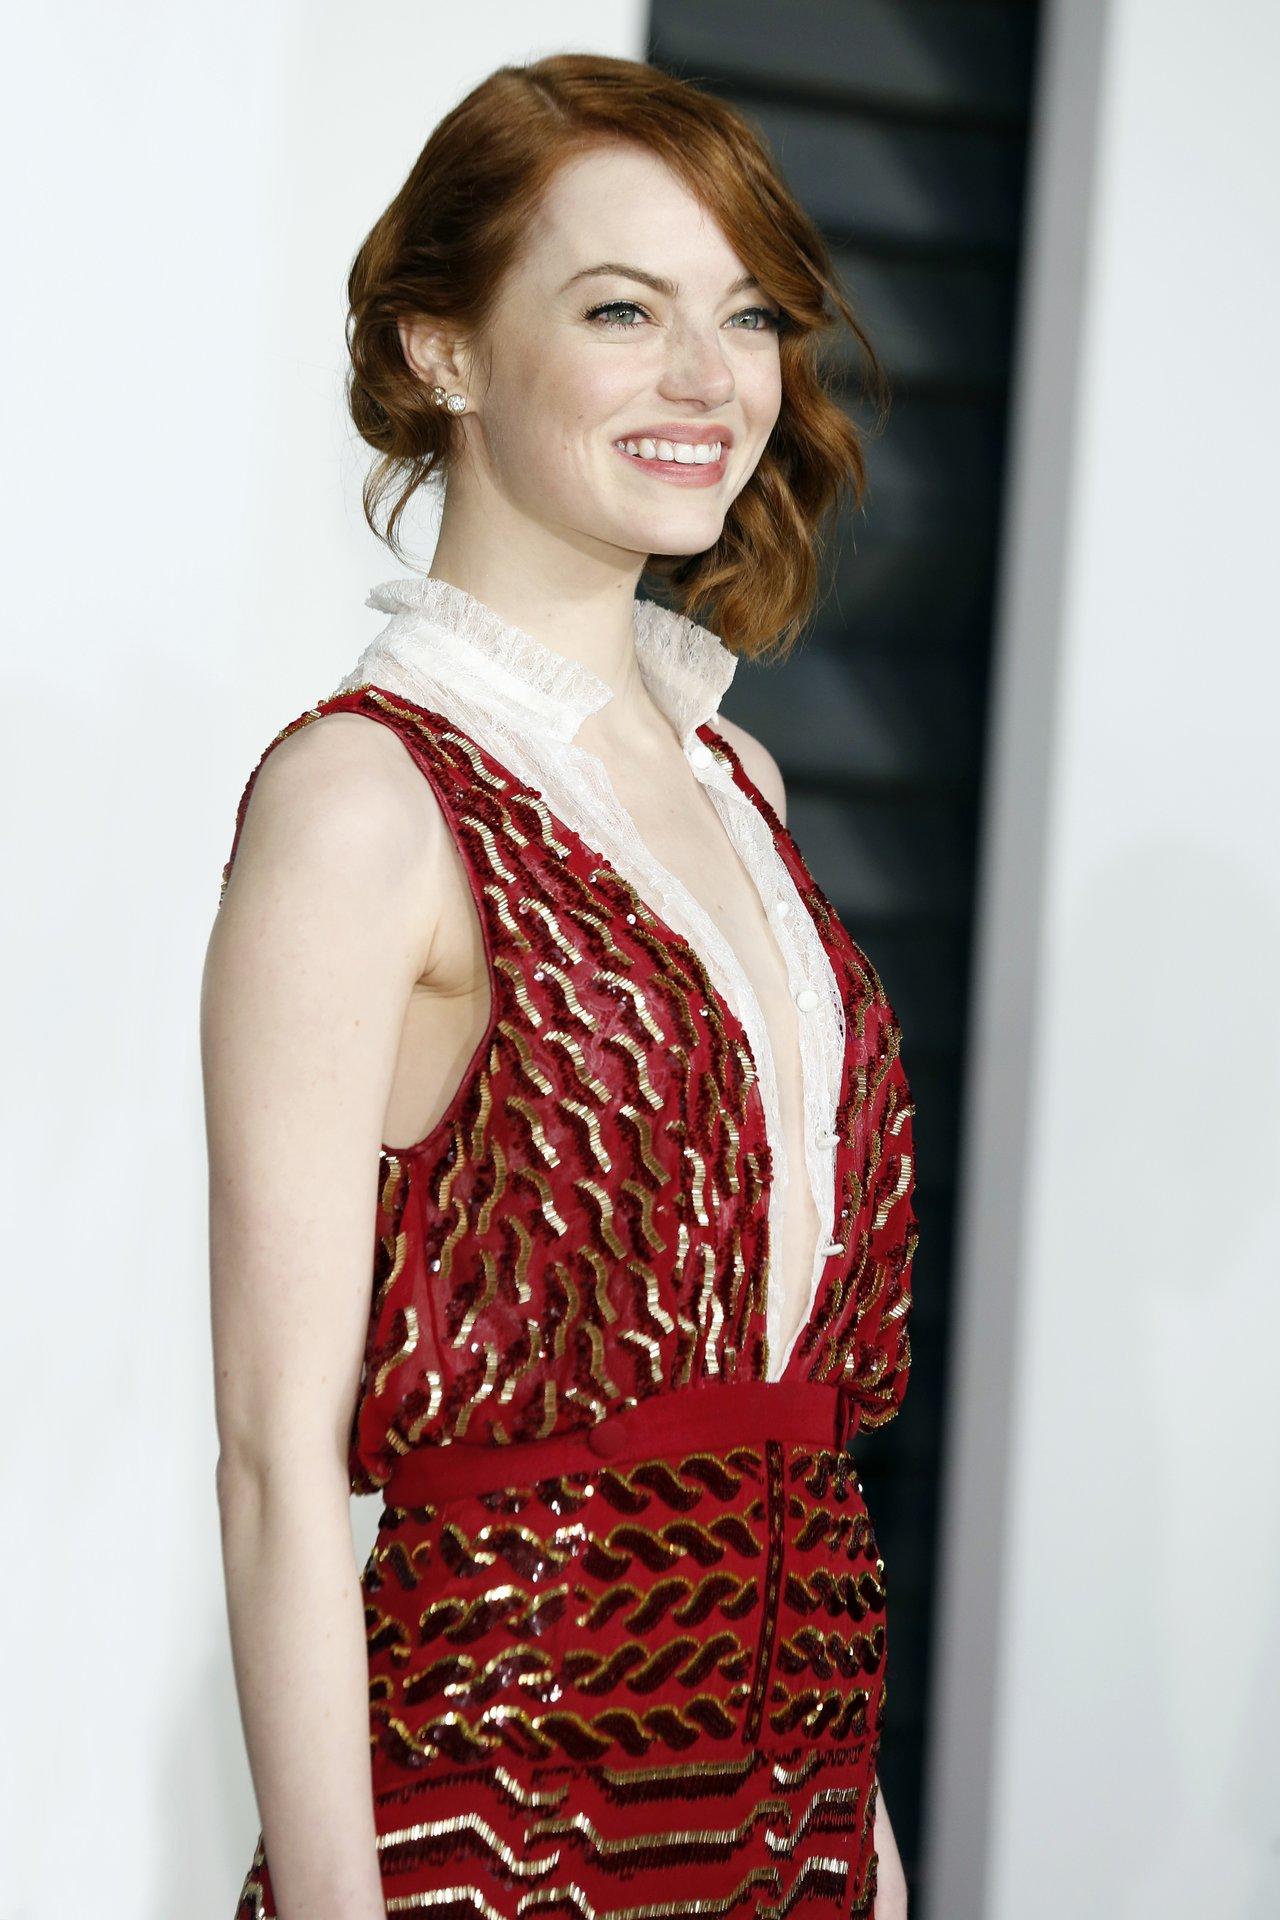 Emma Stone Vanity Fair Magazine Pictures to Pin on Pinterest ... Emma Stone